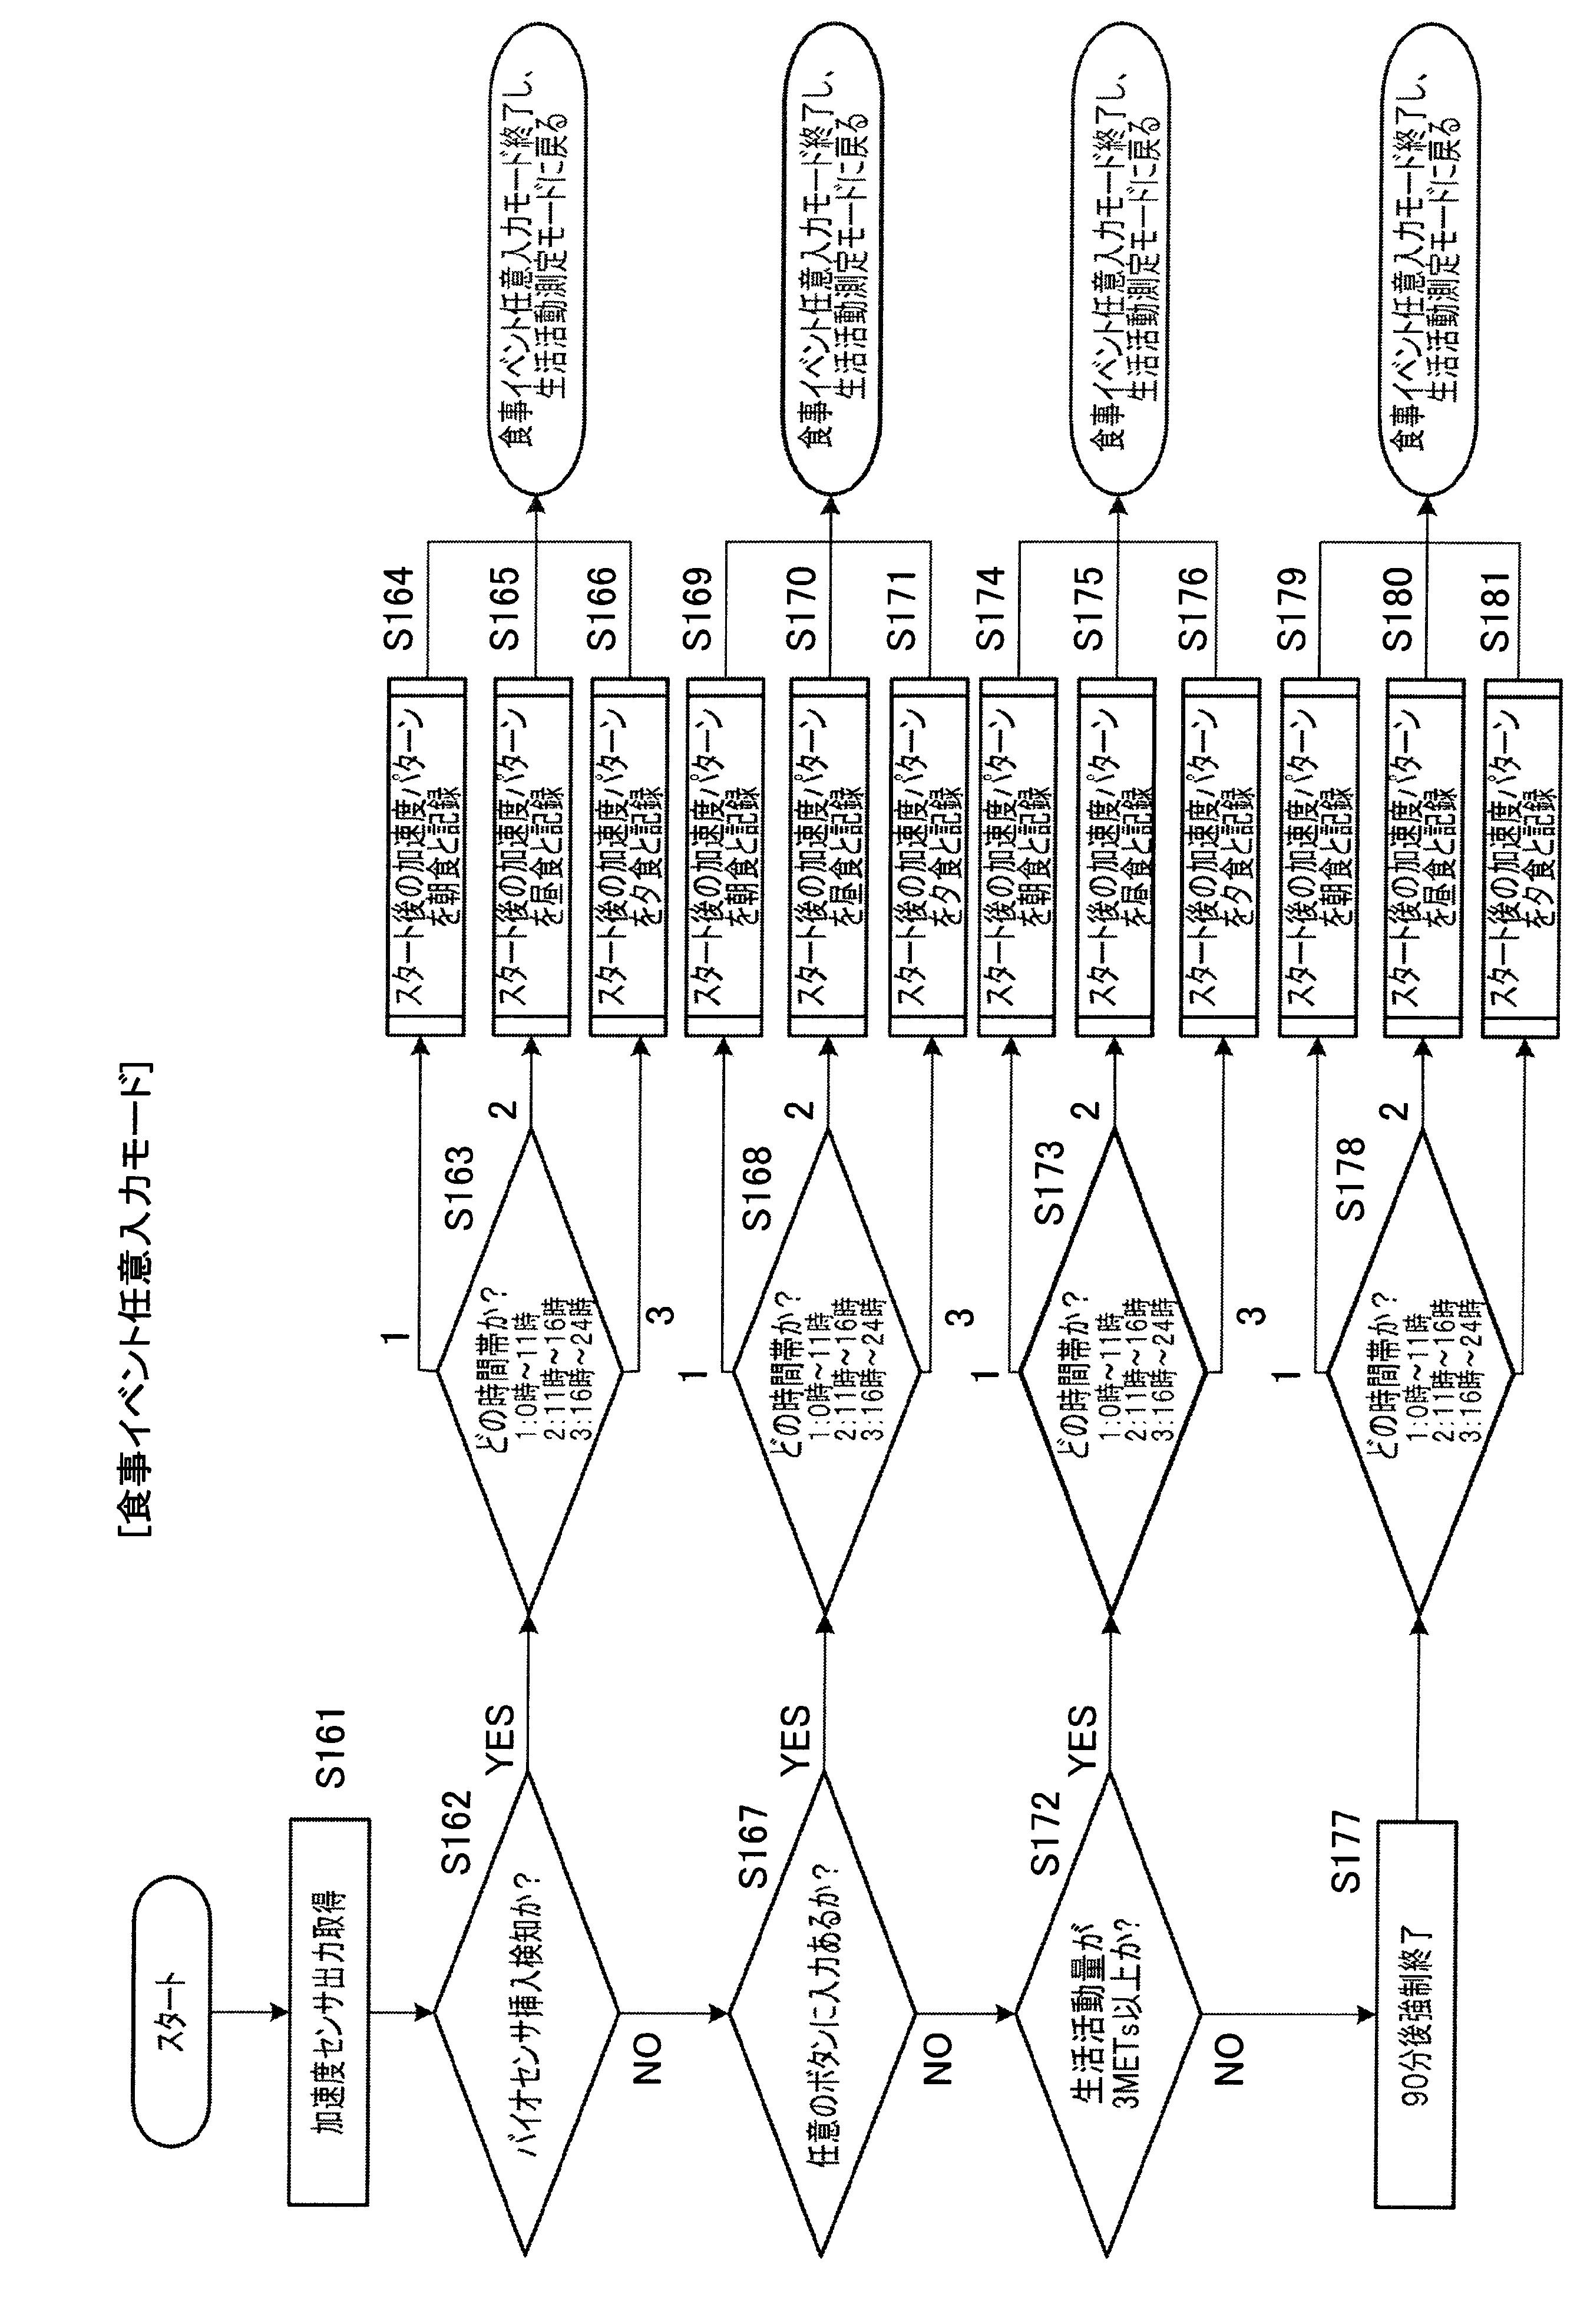 patent wo2010052849a1